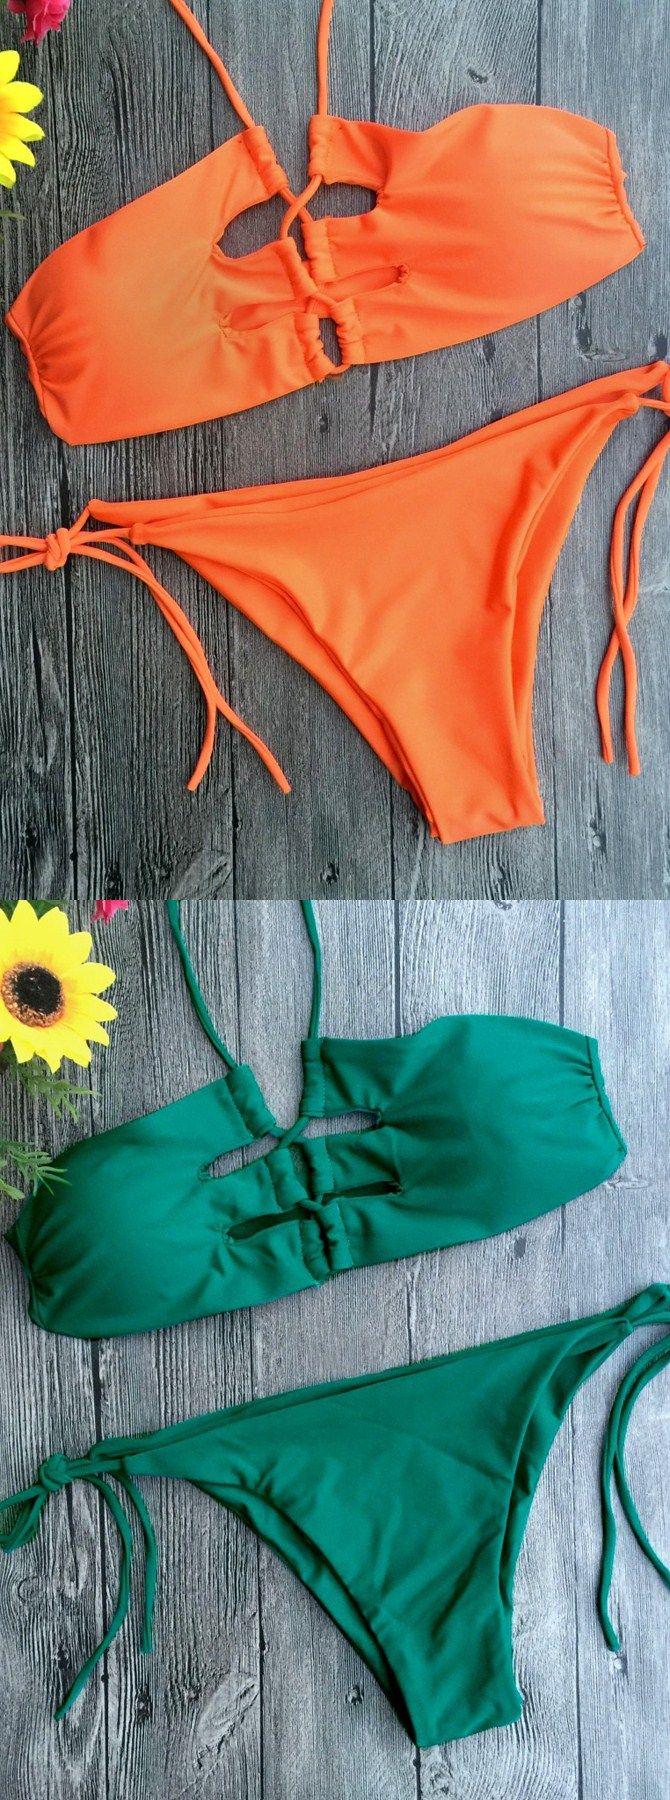 Bandage Lace-Up Orange Solid Bikini, Two Piece Sexy Fashion Bikini, Self-tie Strappy Sides Bottom,  High Leg Cut Bikini Bottom, Halter Front Crisscross Bikini Top 2017